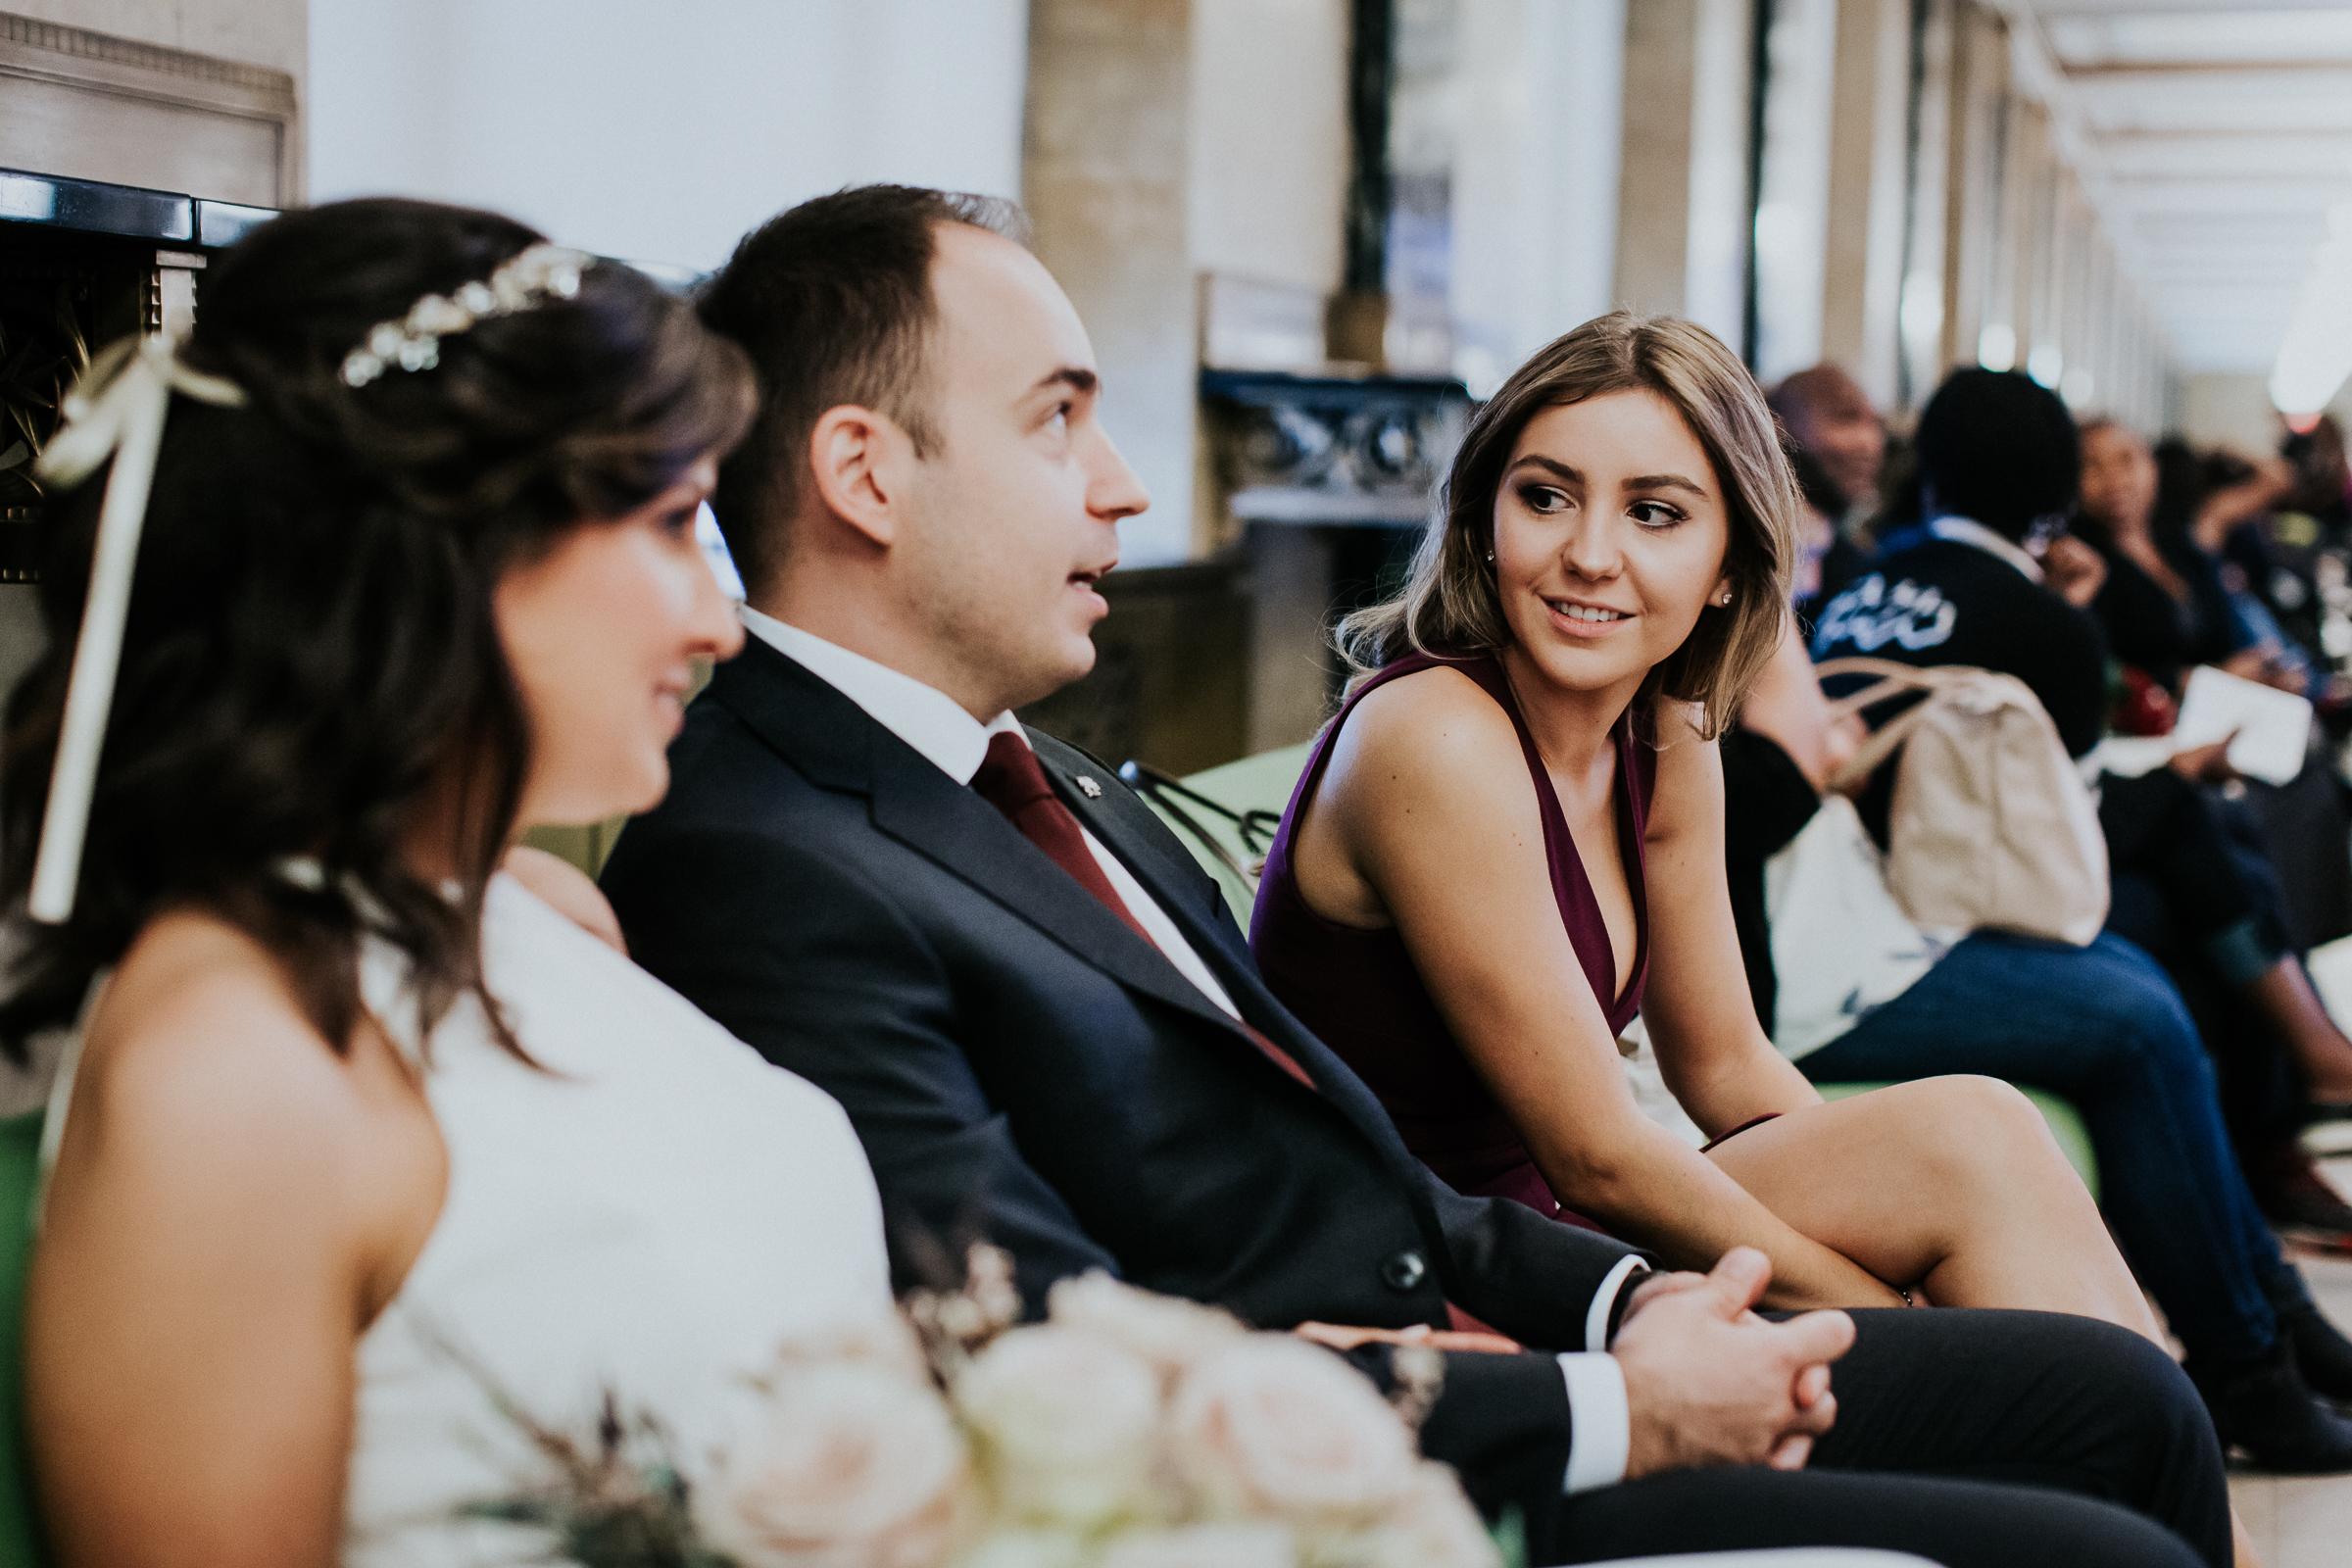 Casa-Apicii-Intimate-Wedding-City-Hall-Elopement-New-York-Documentary-Wedding-Photographer-10.jpg